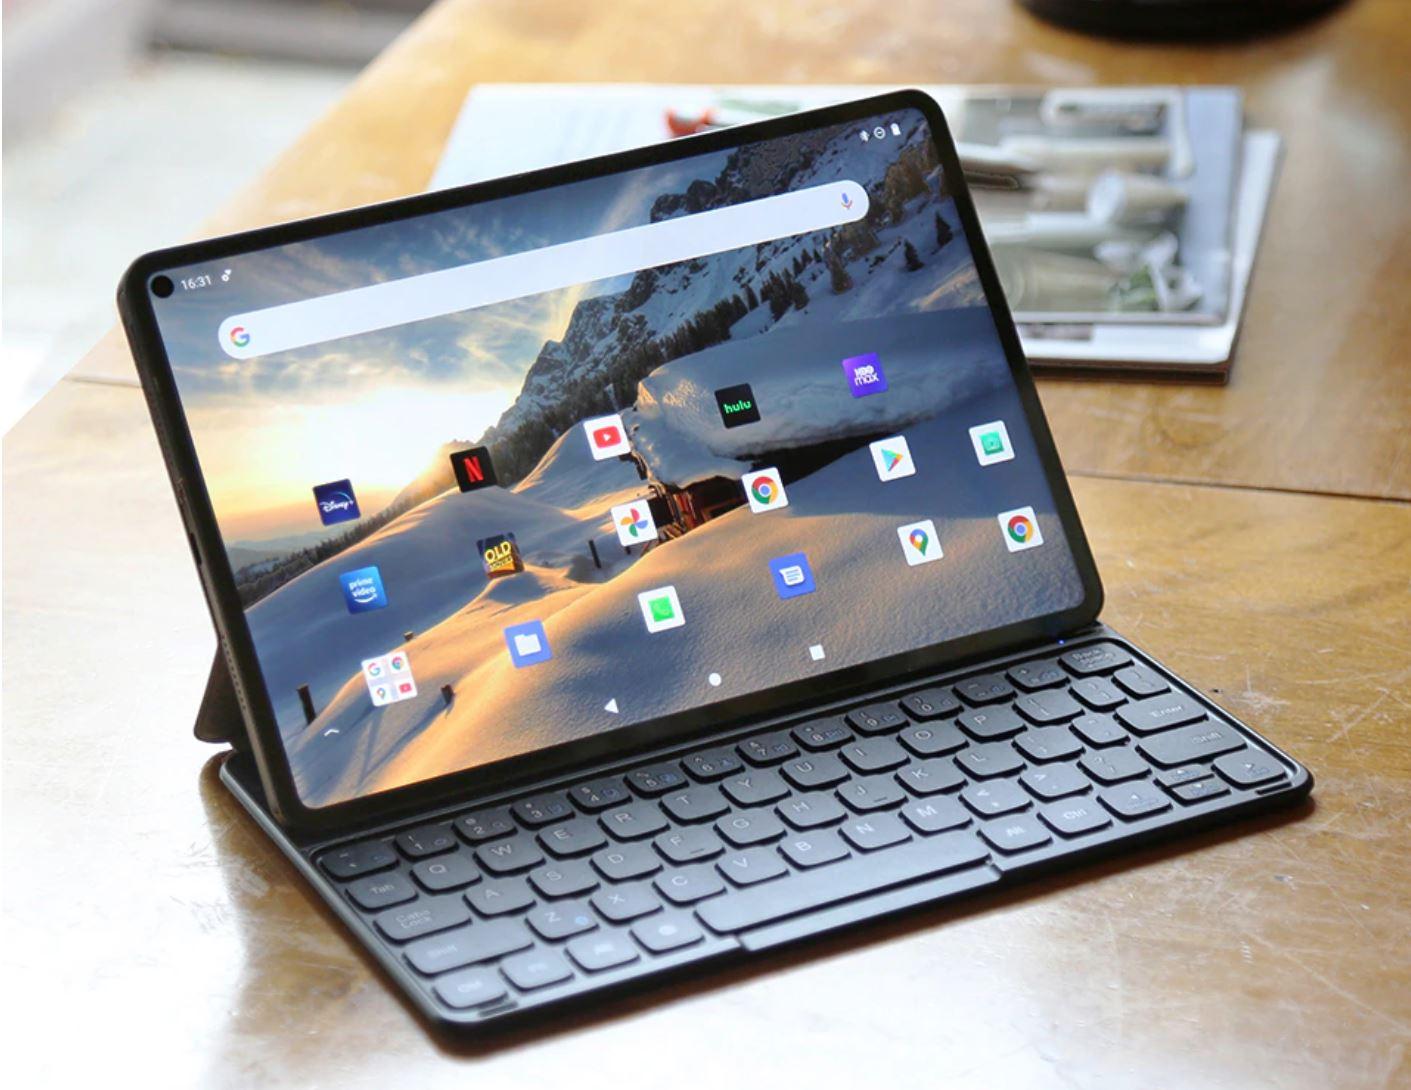 nowe produkty Aliexpress - tablet Chuwi HiPad Pro LTE - alternatywa iPad Pro